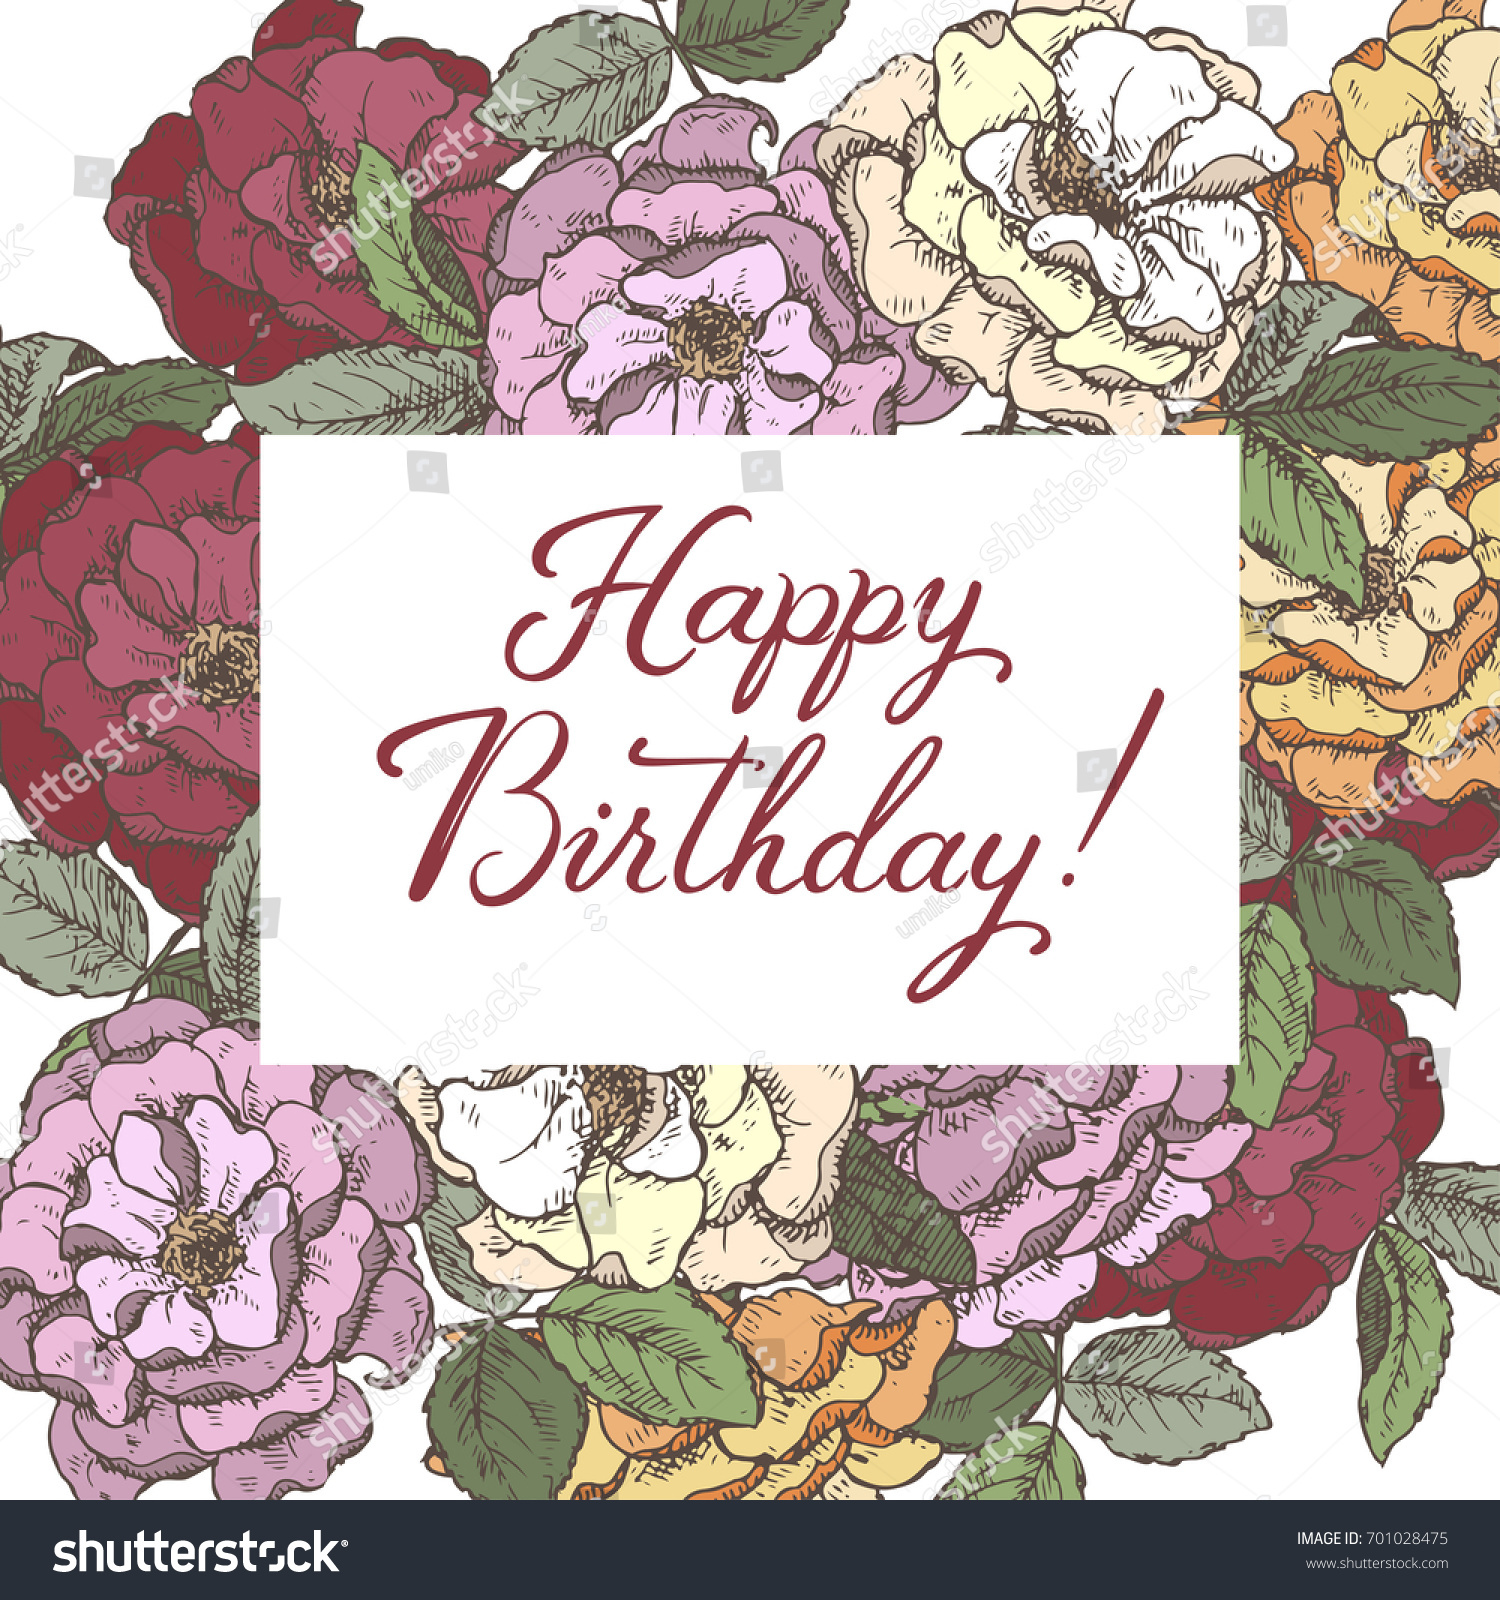 Romantic Birthday Greeting Card Template Brush Stock Vector Royalty